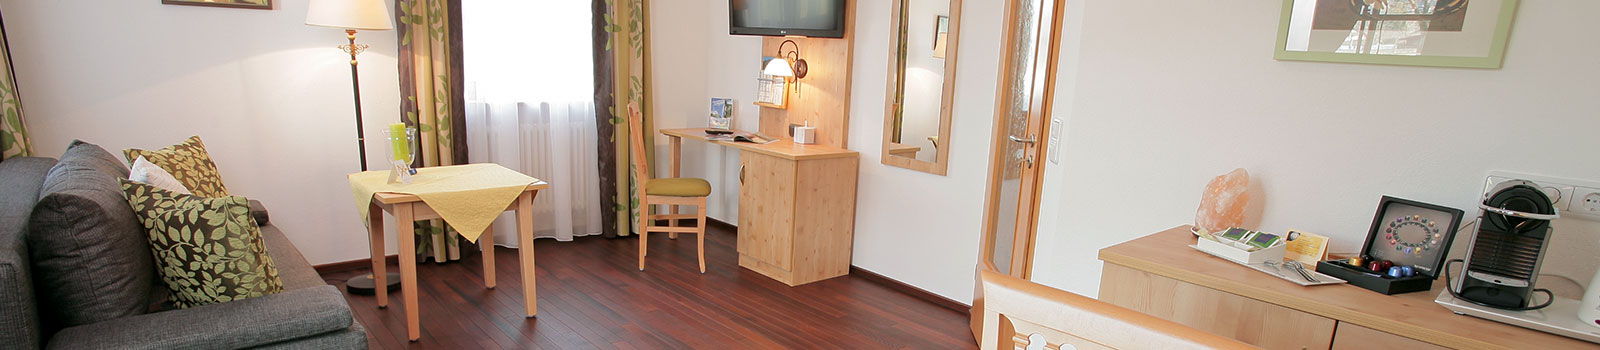 Prillerhof - Ferienhotel garni